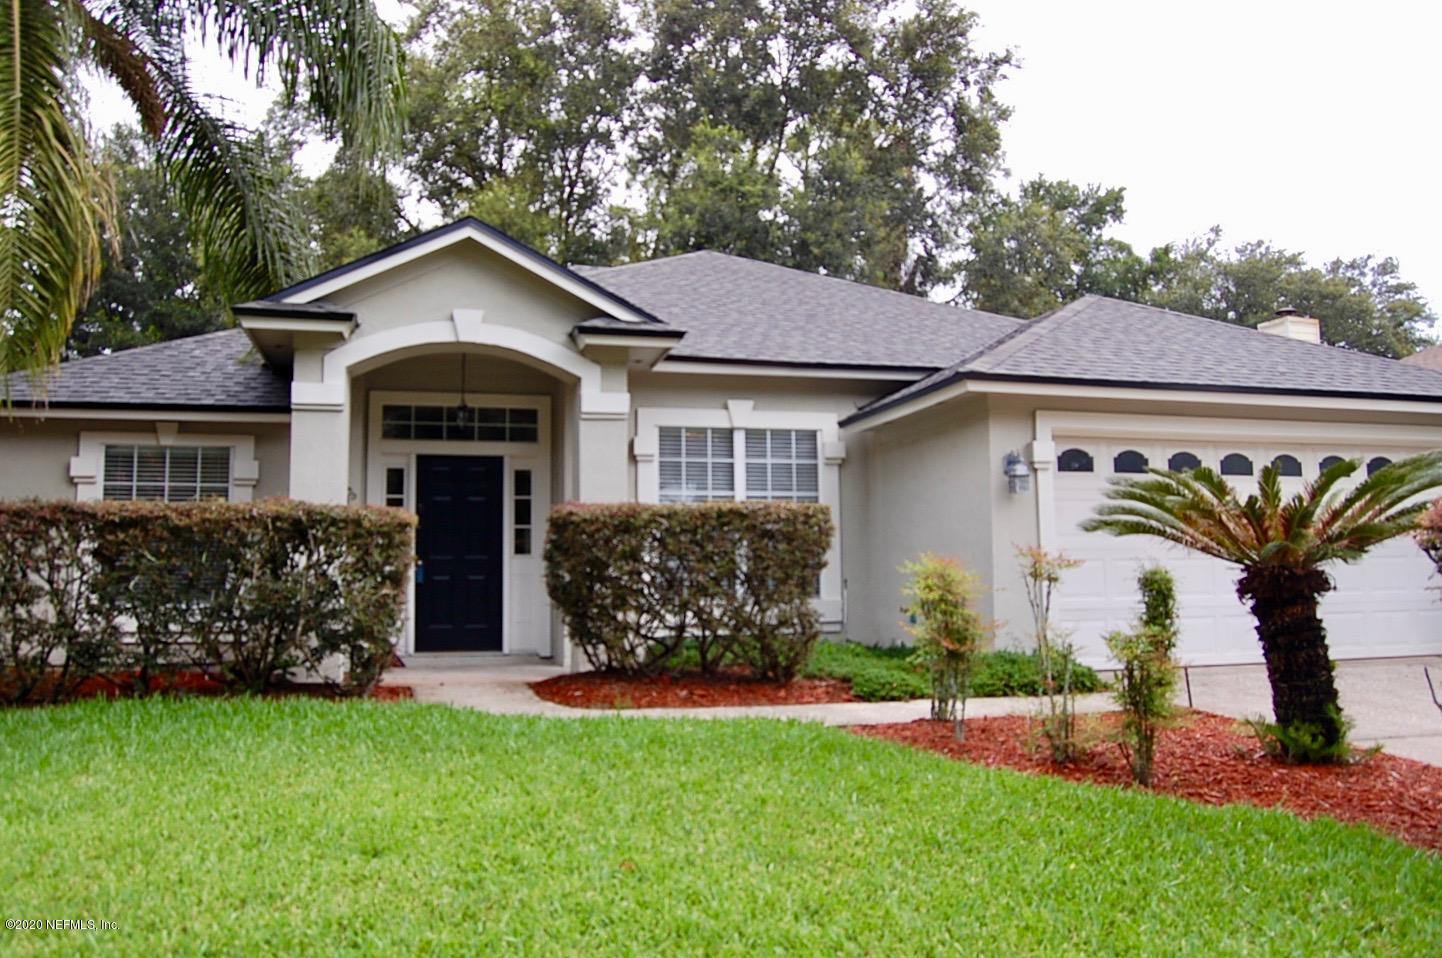 301 ELVERTON, JACKSONVILLE, FLORIDA 32259, 4 Bedrooms Bedrooms, ,2 BathroomsBathrooms,Residential,For sale,ELVERTON,1061869